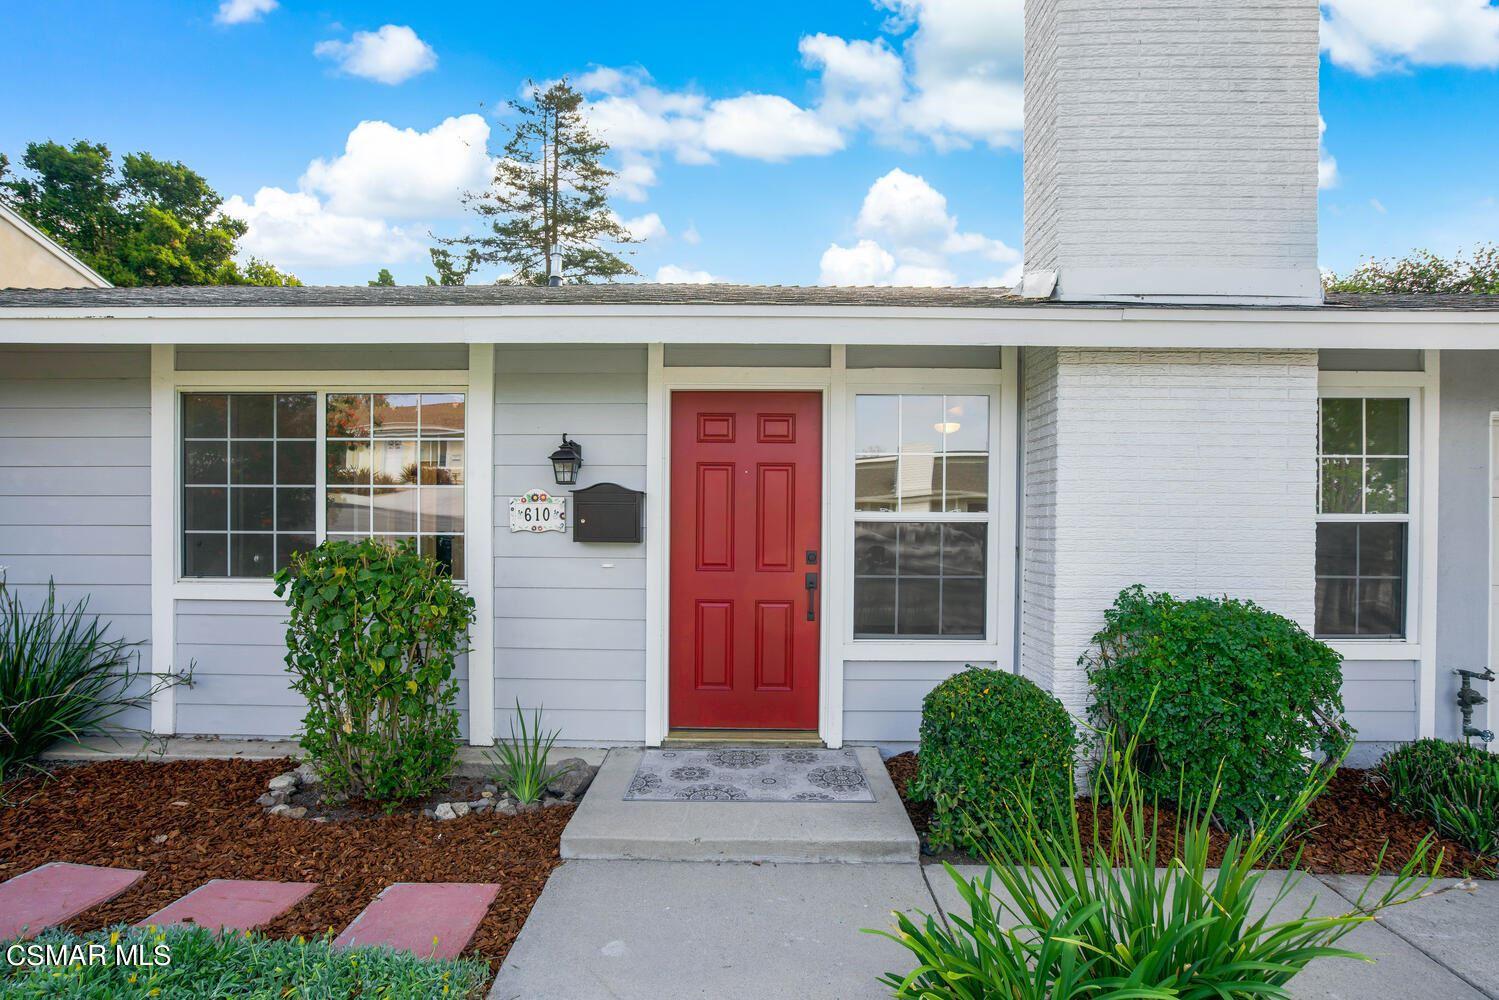 610 Evergreen Avenue, Newbury Park, CA 91320 - MLS#: 221001927